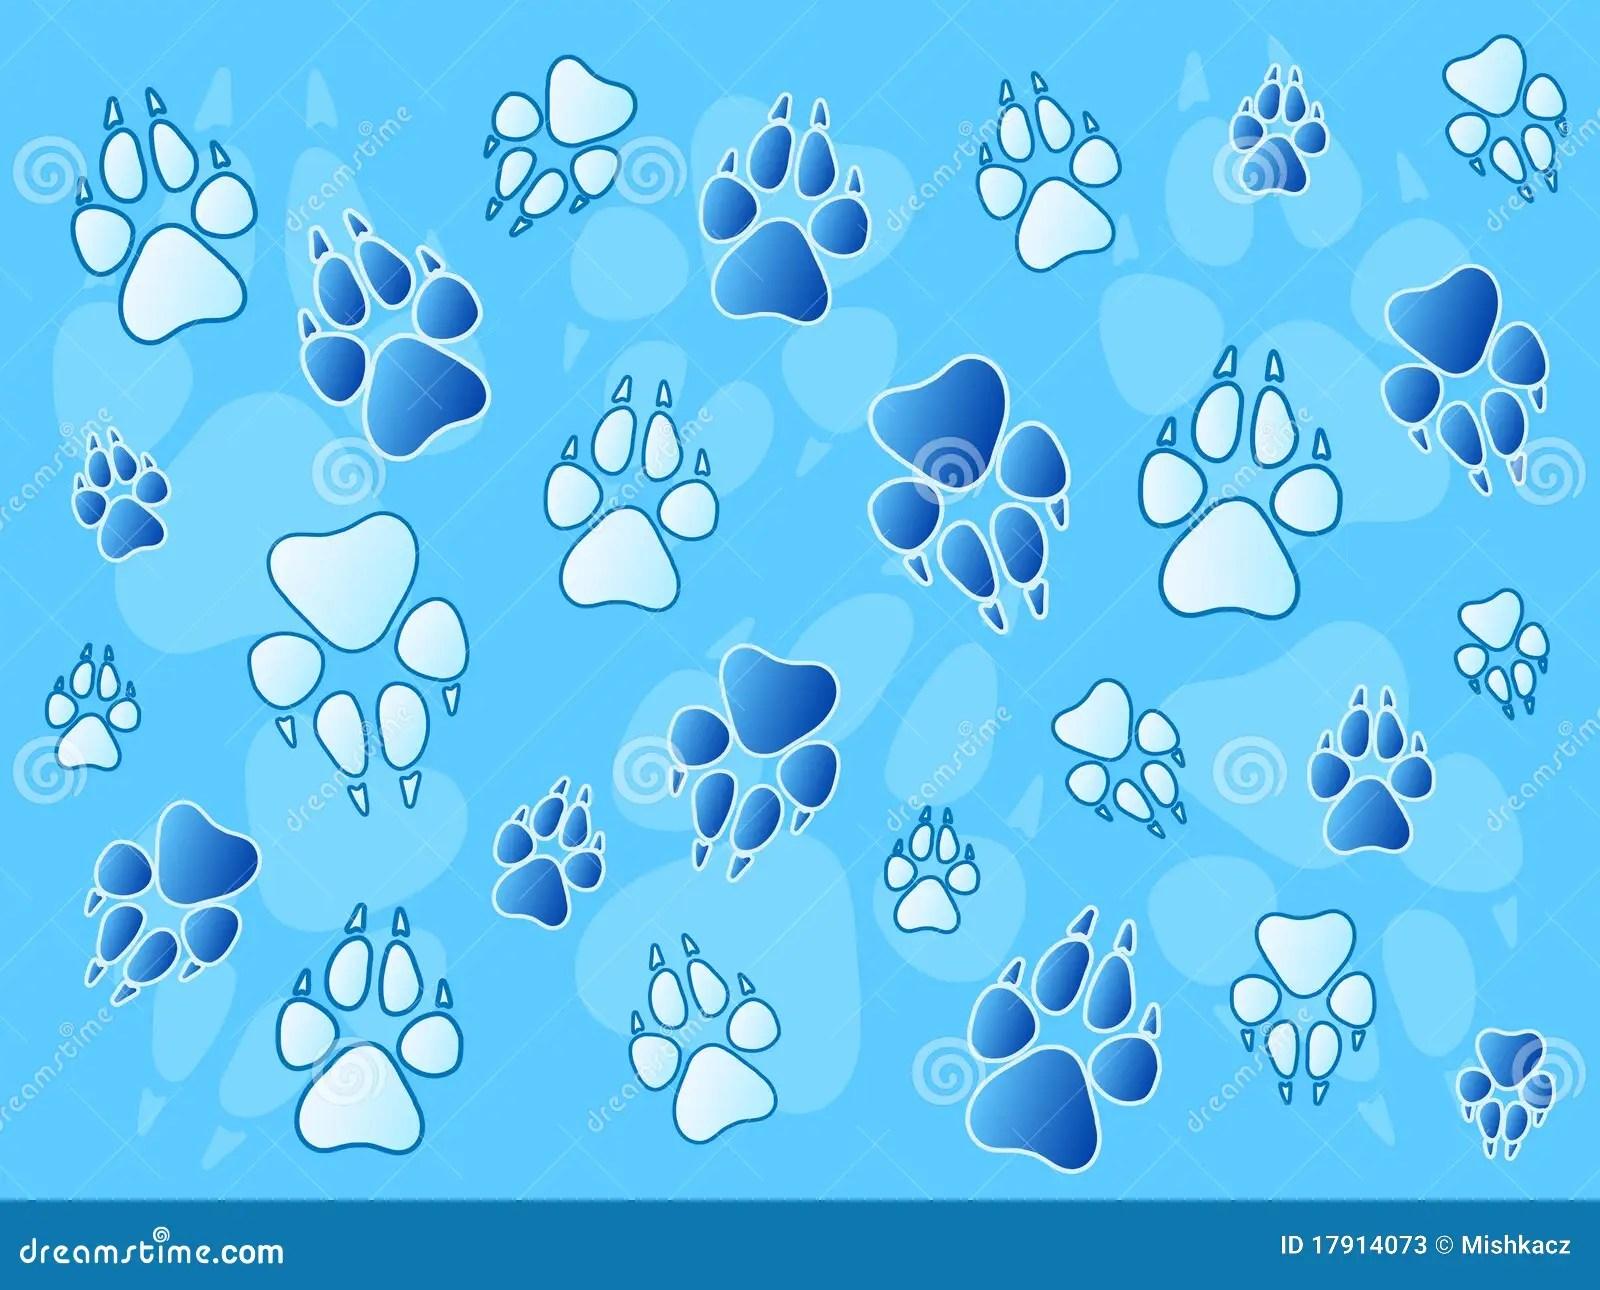 Animal Print Wallpaper Border Paw Prints Background Stock Photos Image 17914073